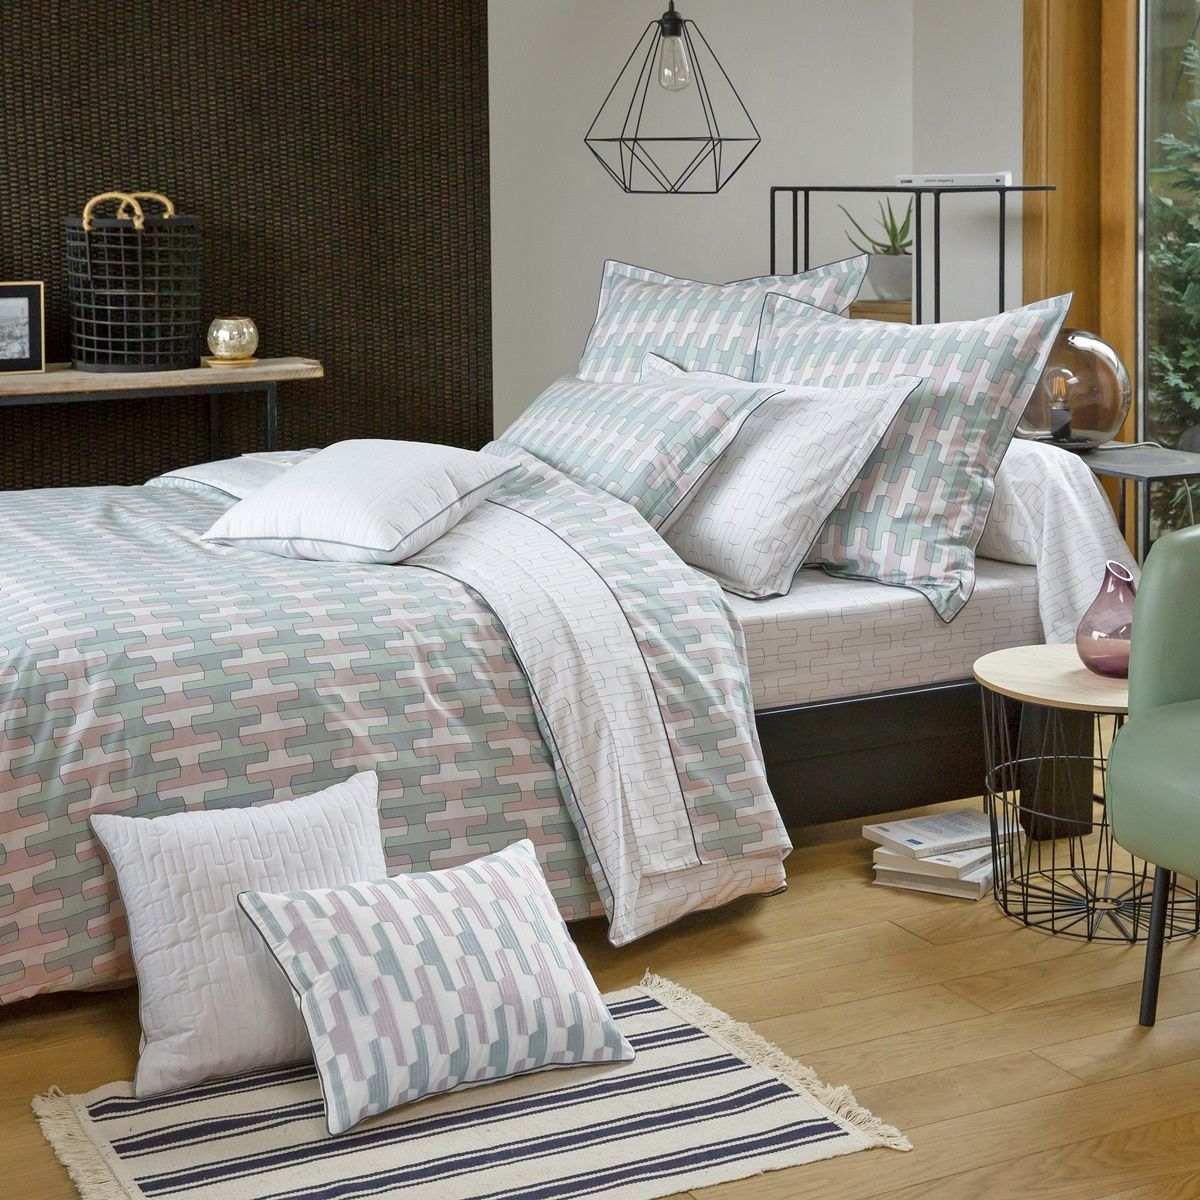 Duvet Cover Origami   Bed linen   Tradition des Vosges